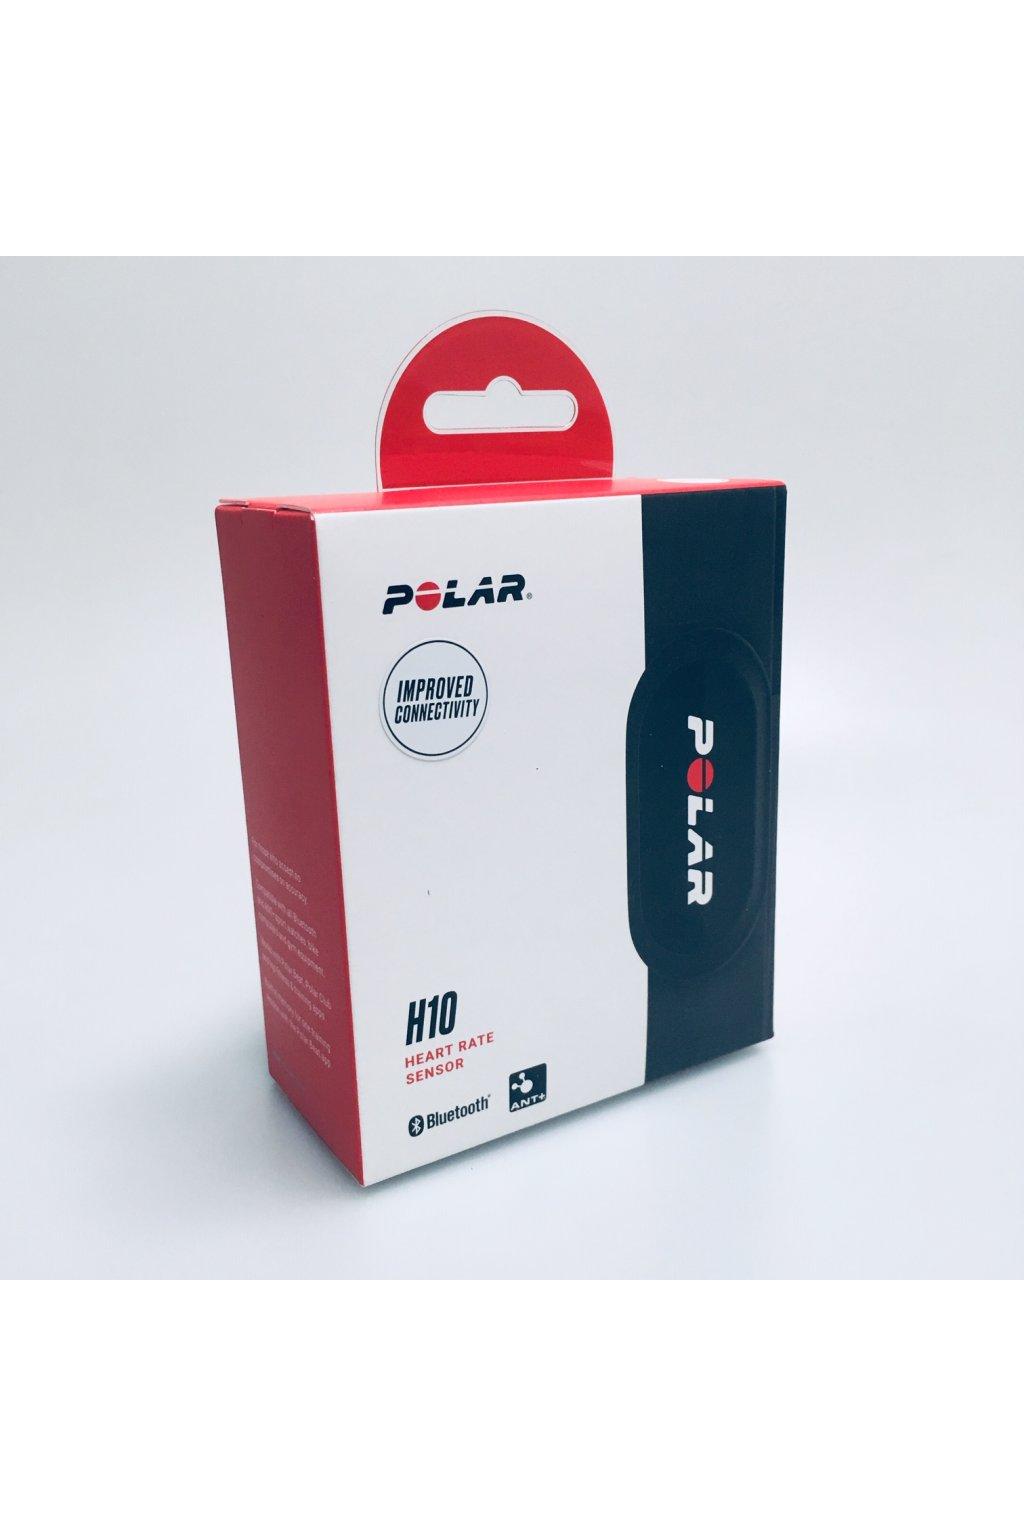 polar h10 plus